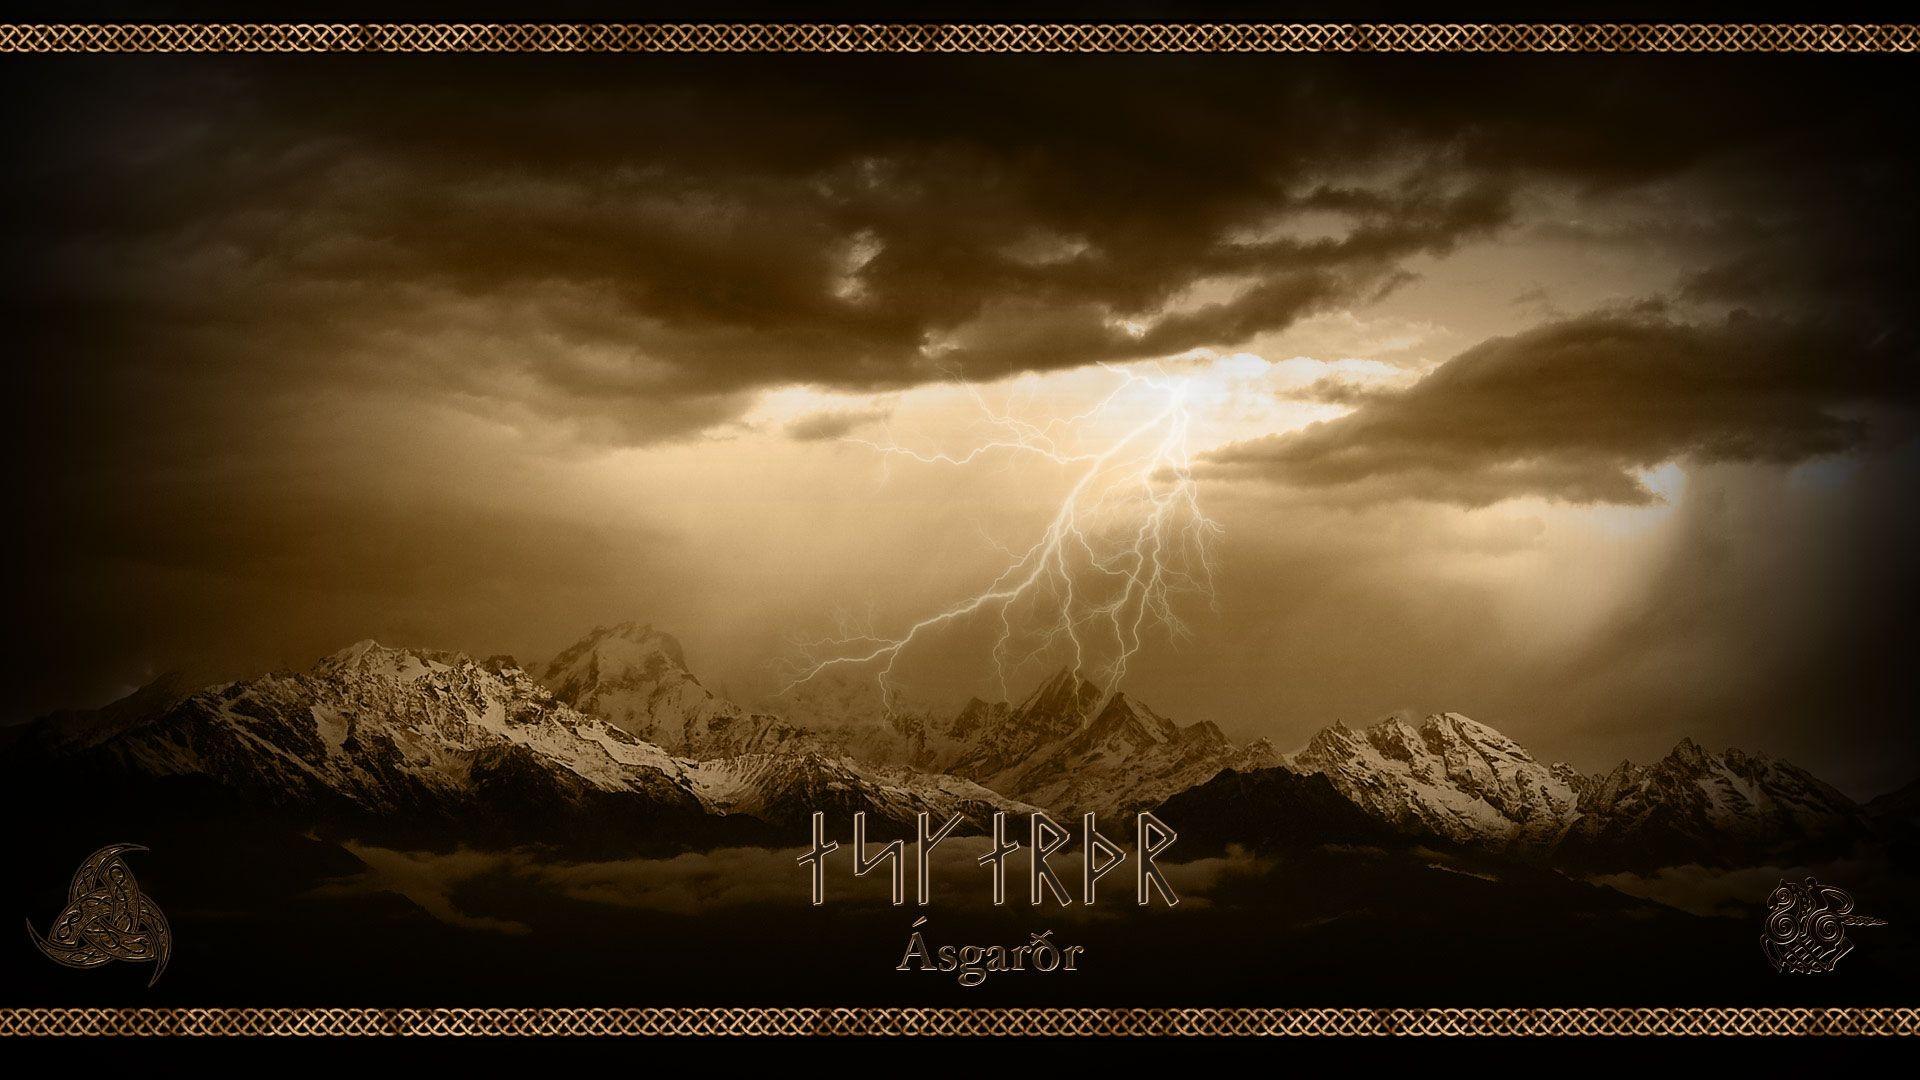 Res: 1920x1080, Asgard wallpaper free